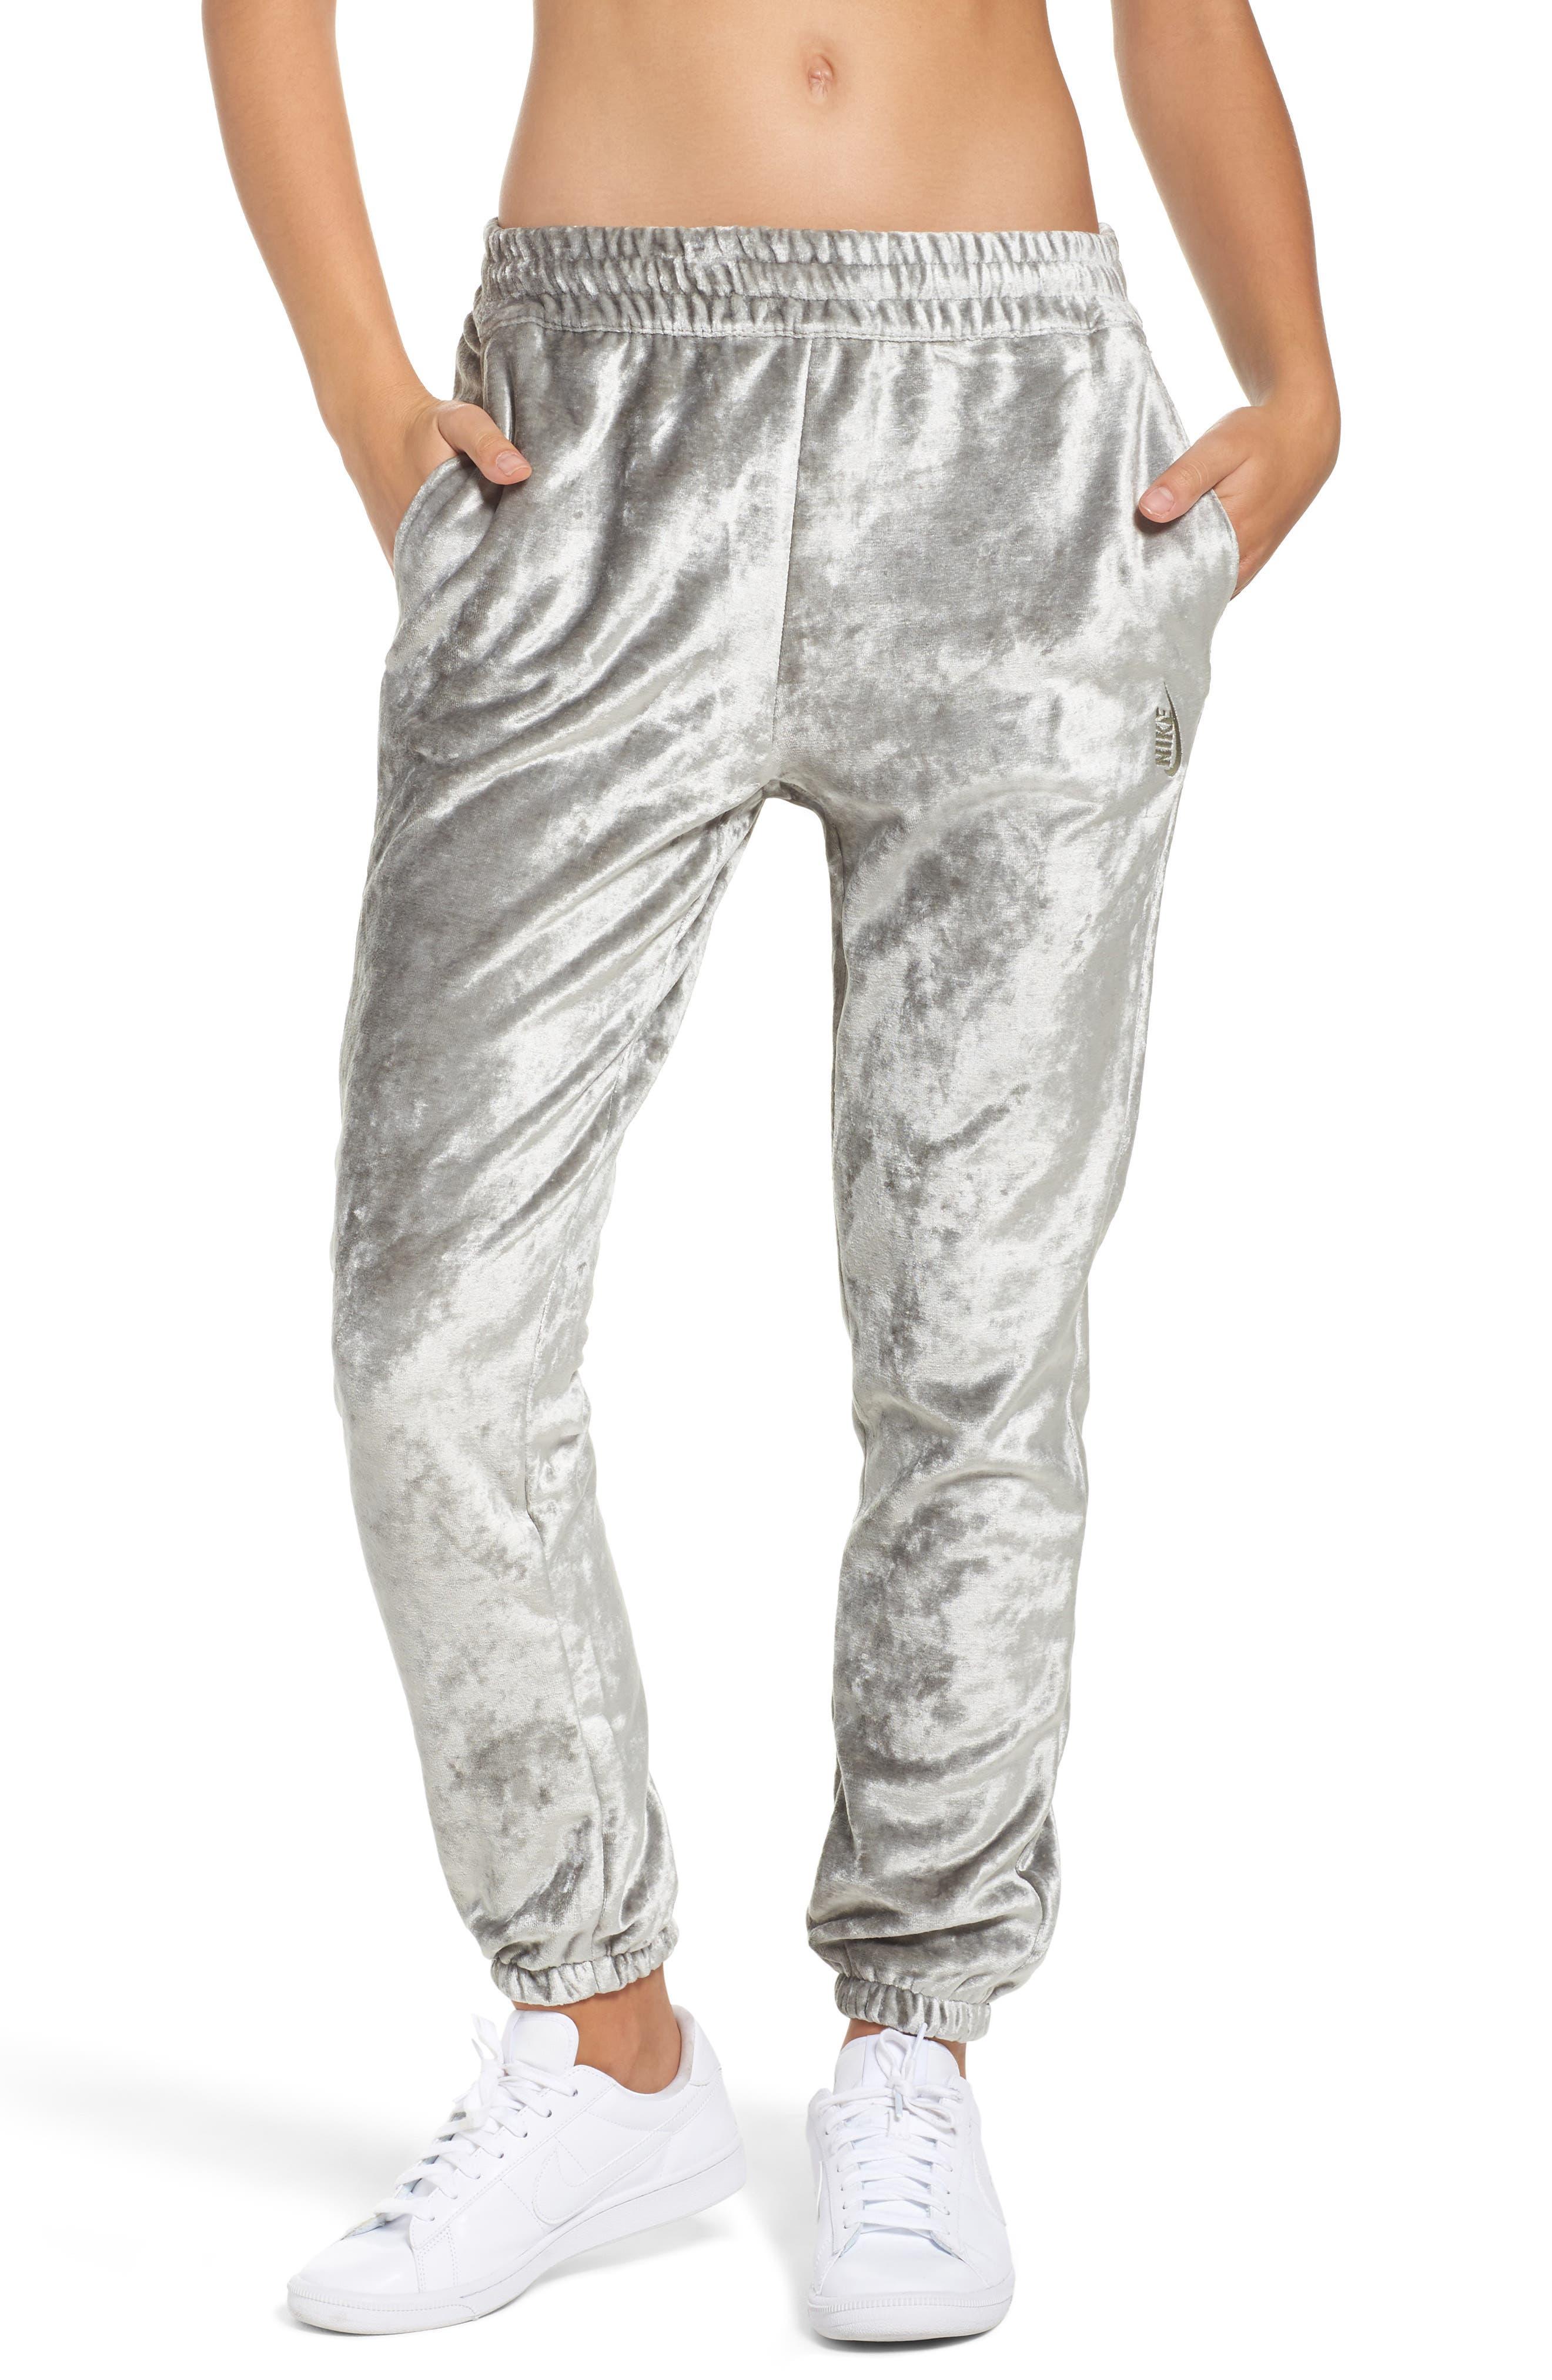 NIKE NikeLab Essentials Women's Velour Pants, Main, color, 020